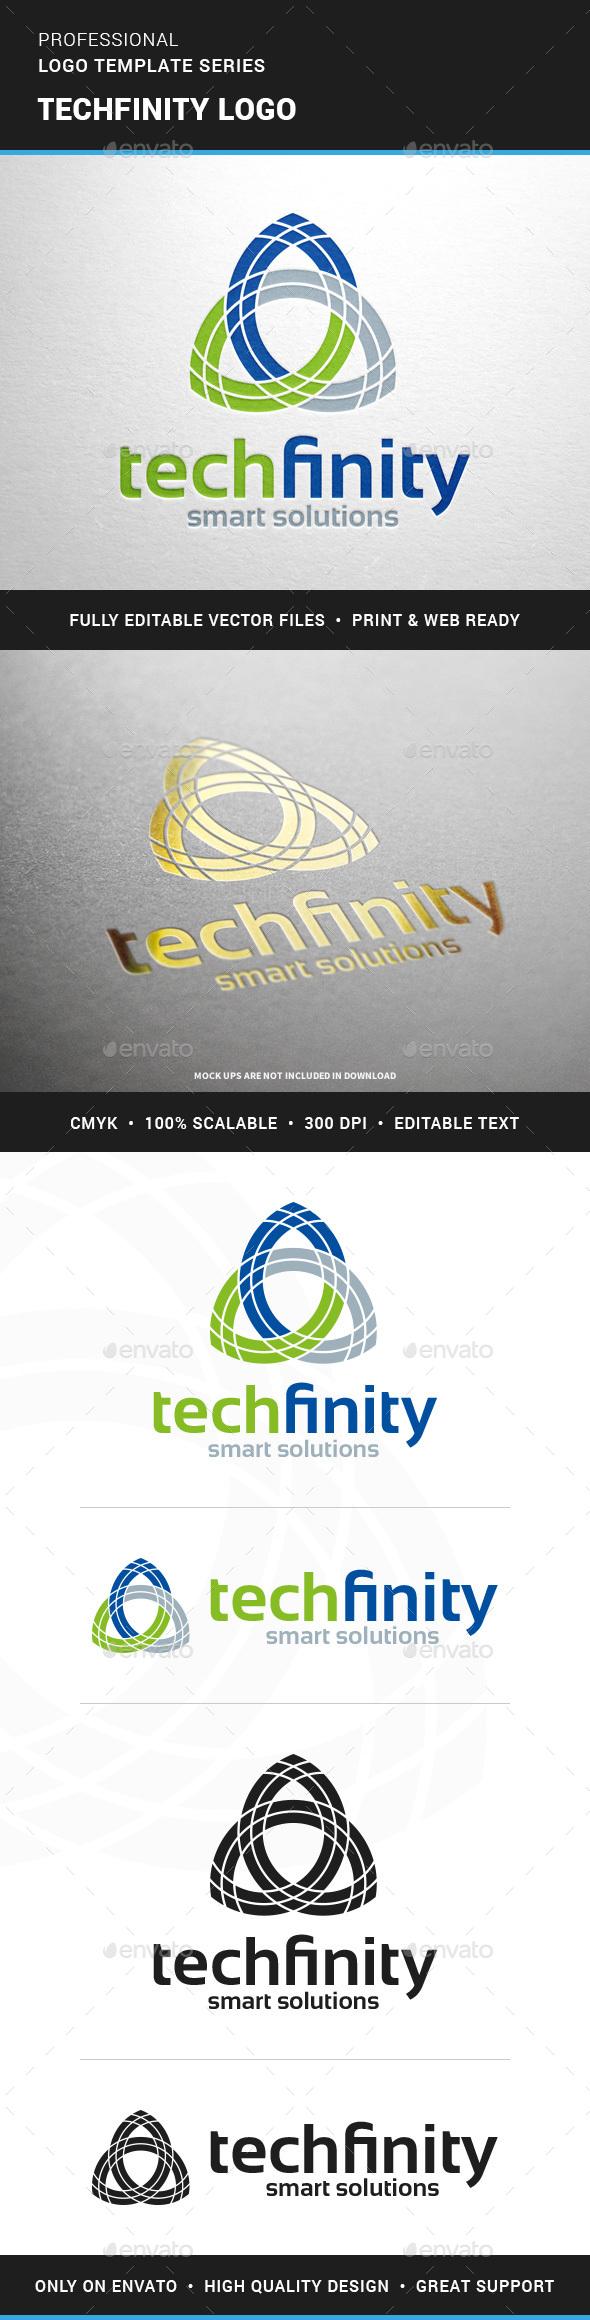 Techfinity Logo Template - Logo Templates